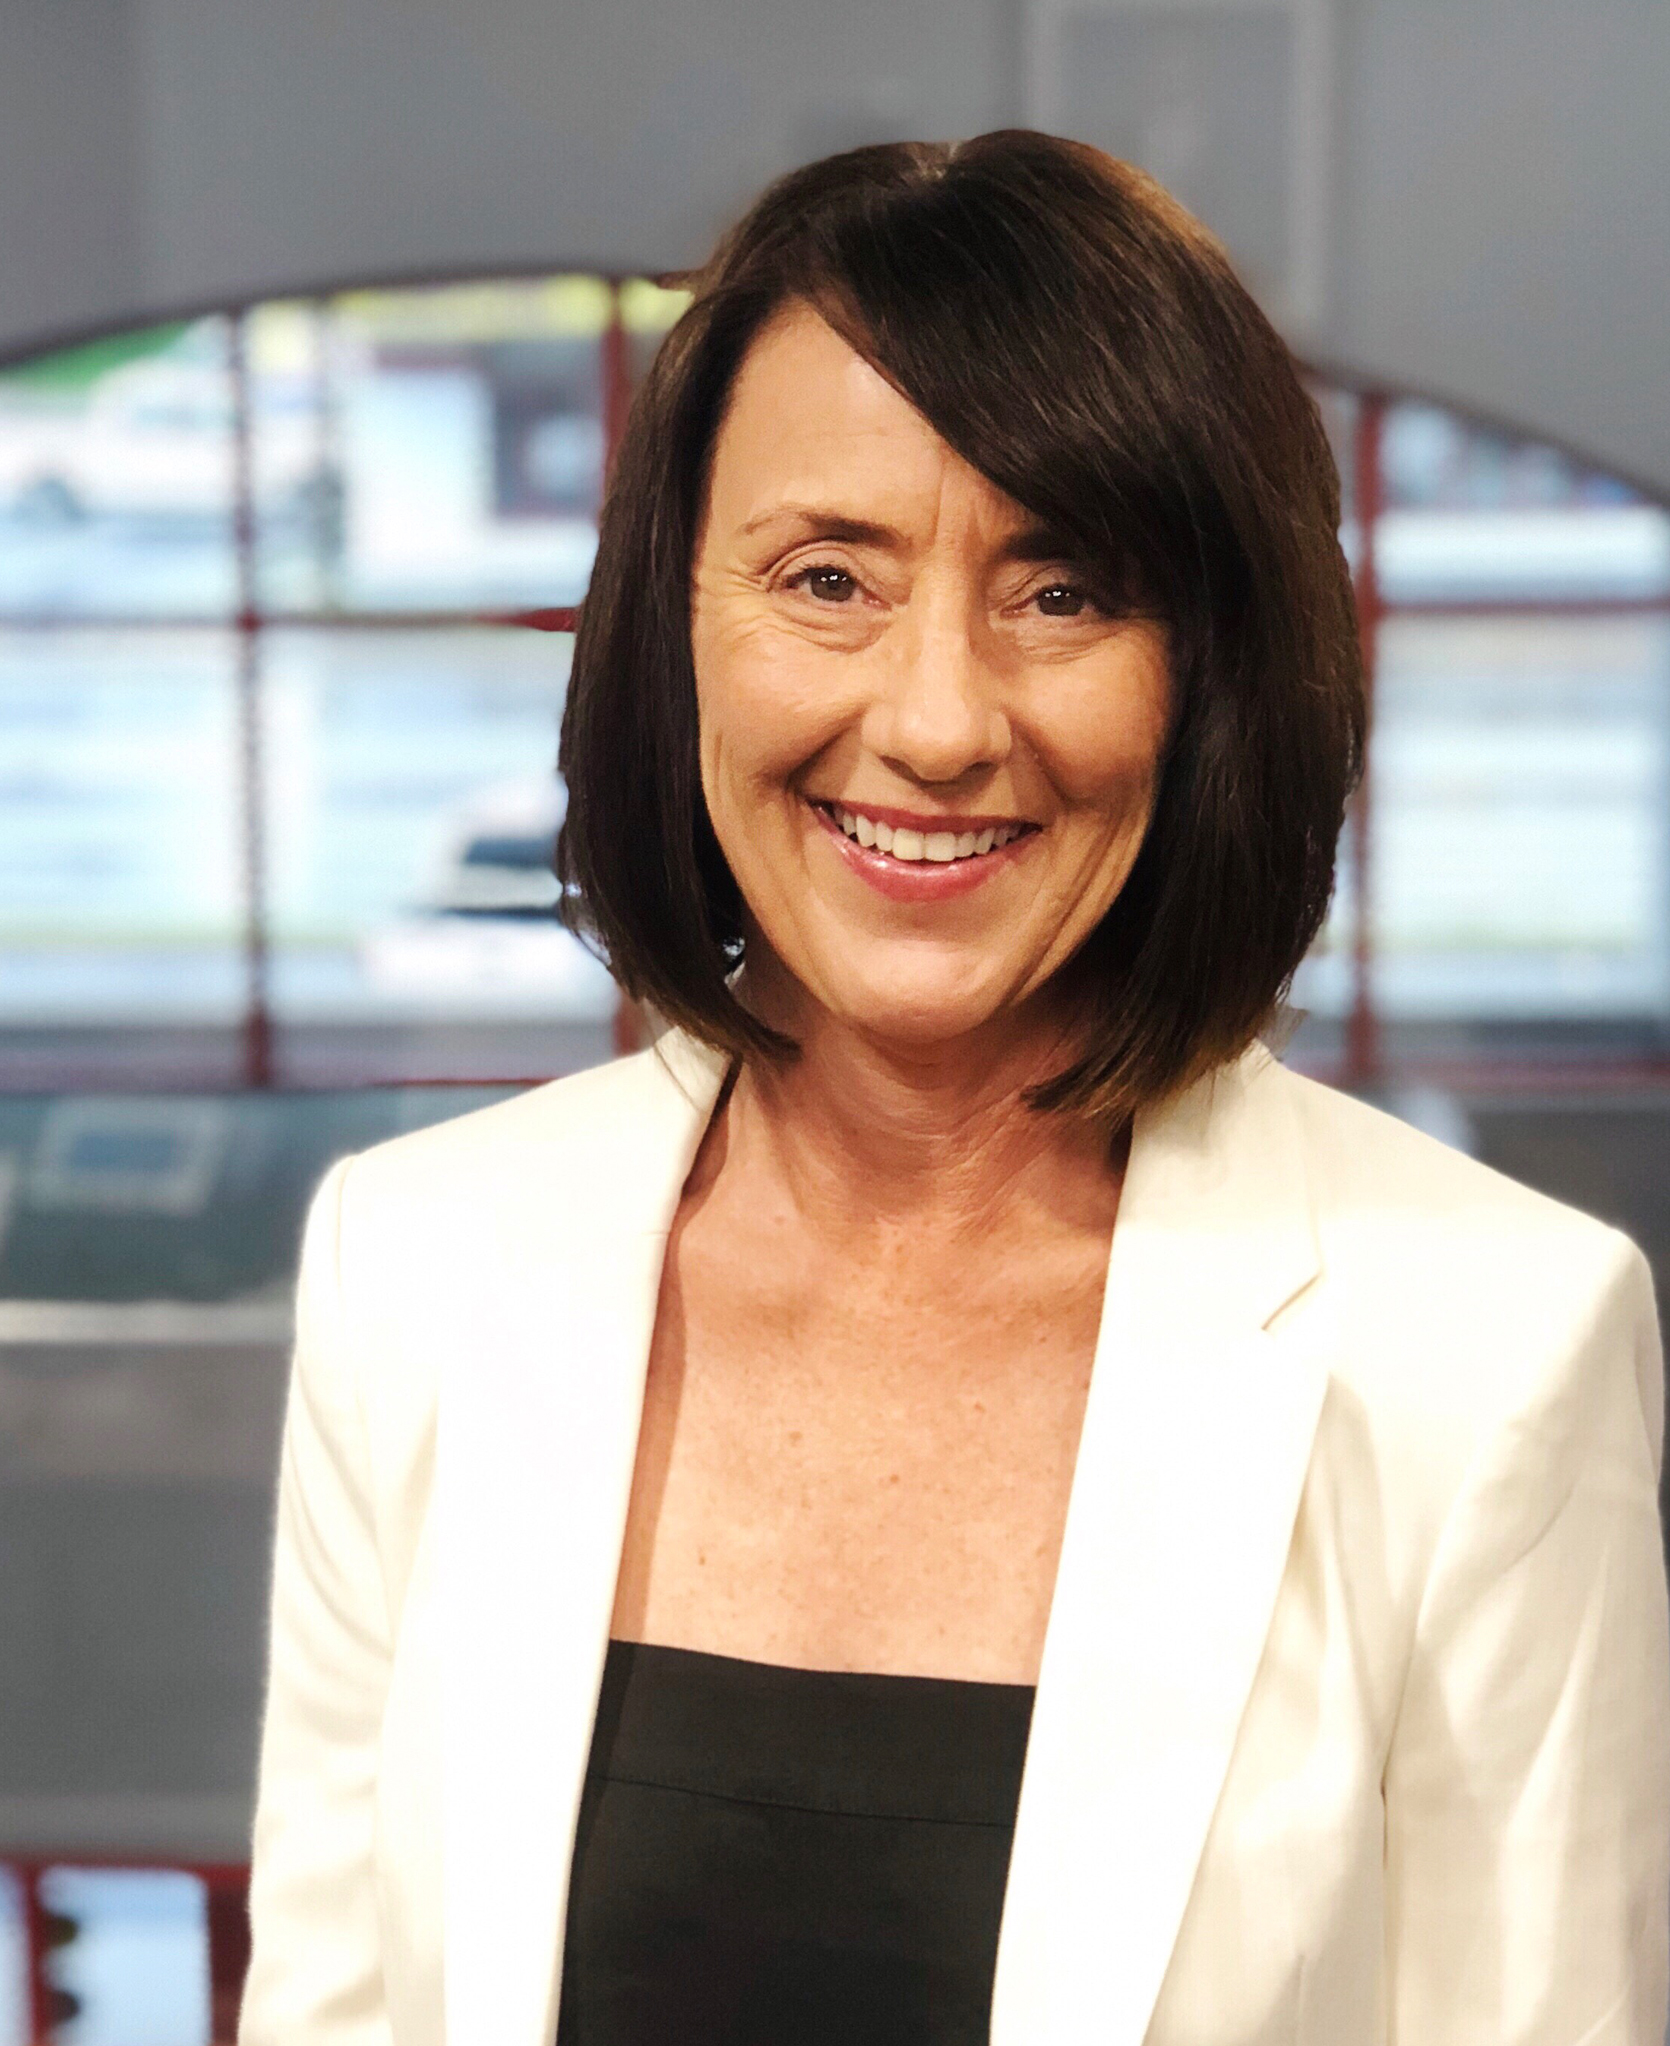 Donna Stockton